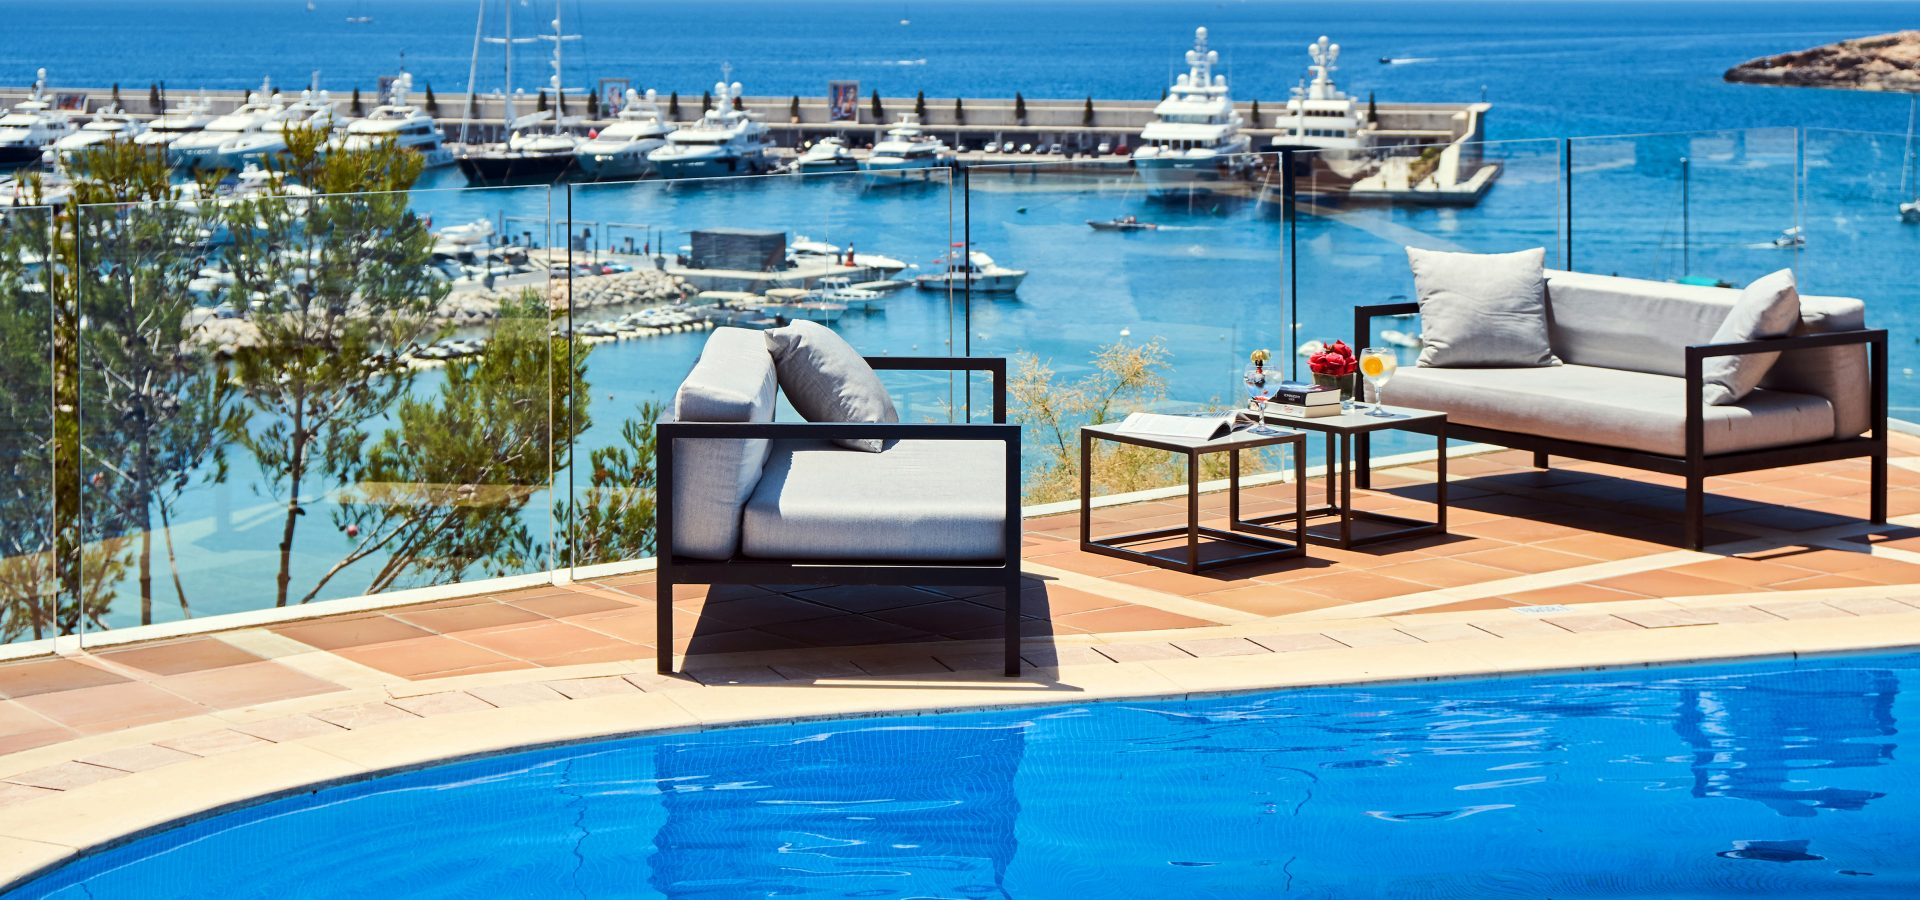 Port Adriano Luxury 5 Star Hotel Pure Salt Port Adriano